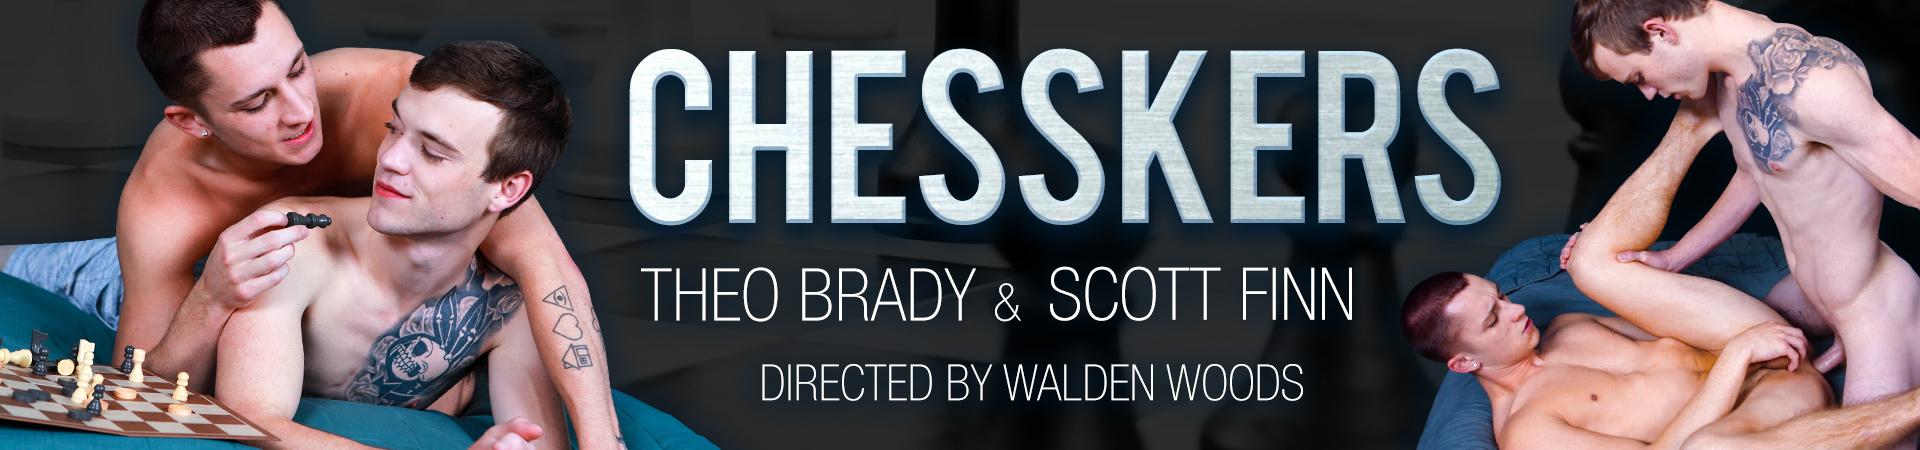 Next Door Studios Chesskers Featuring Scott Finn and Theo Brady